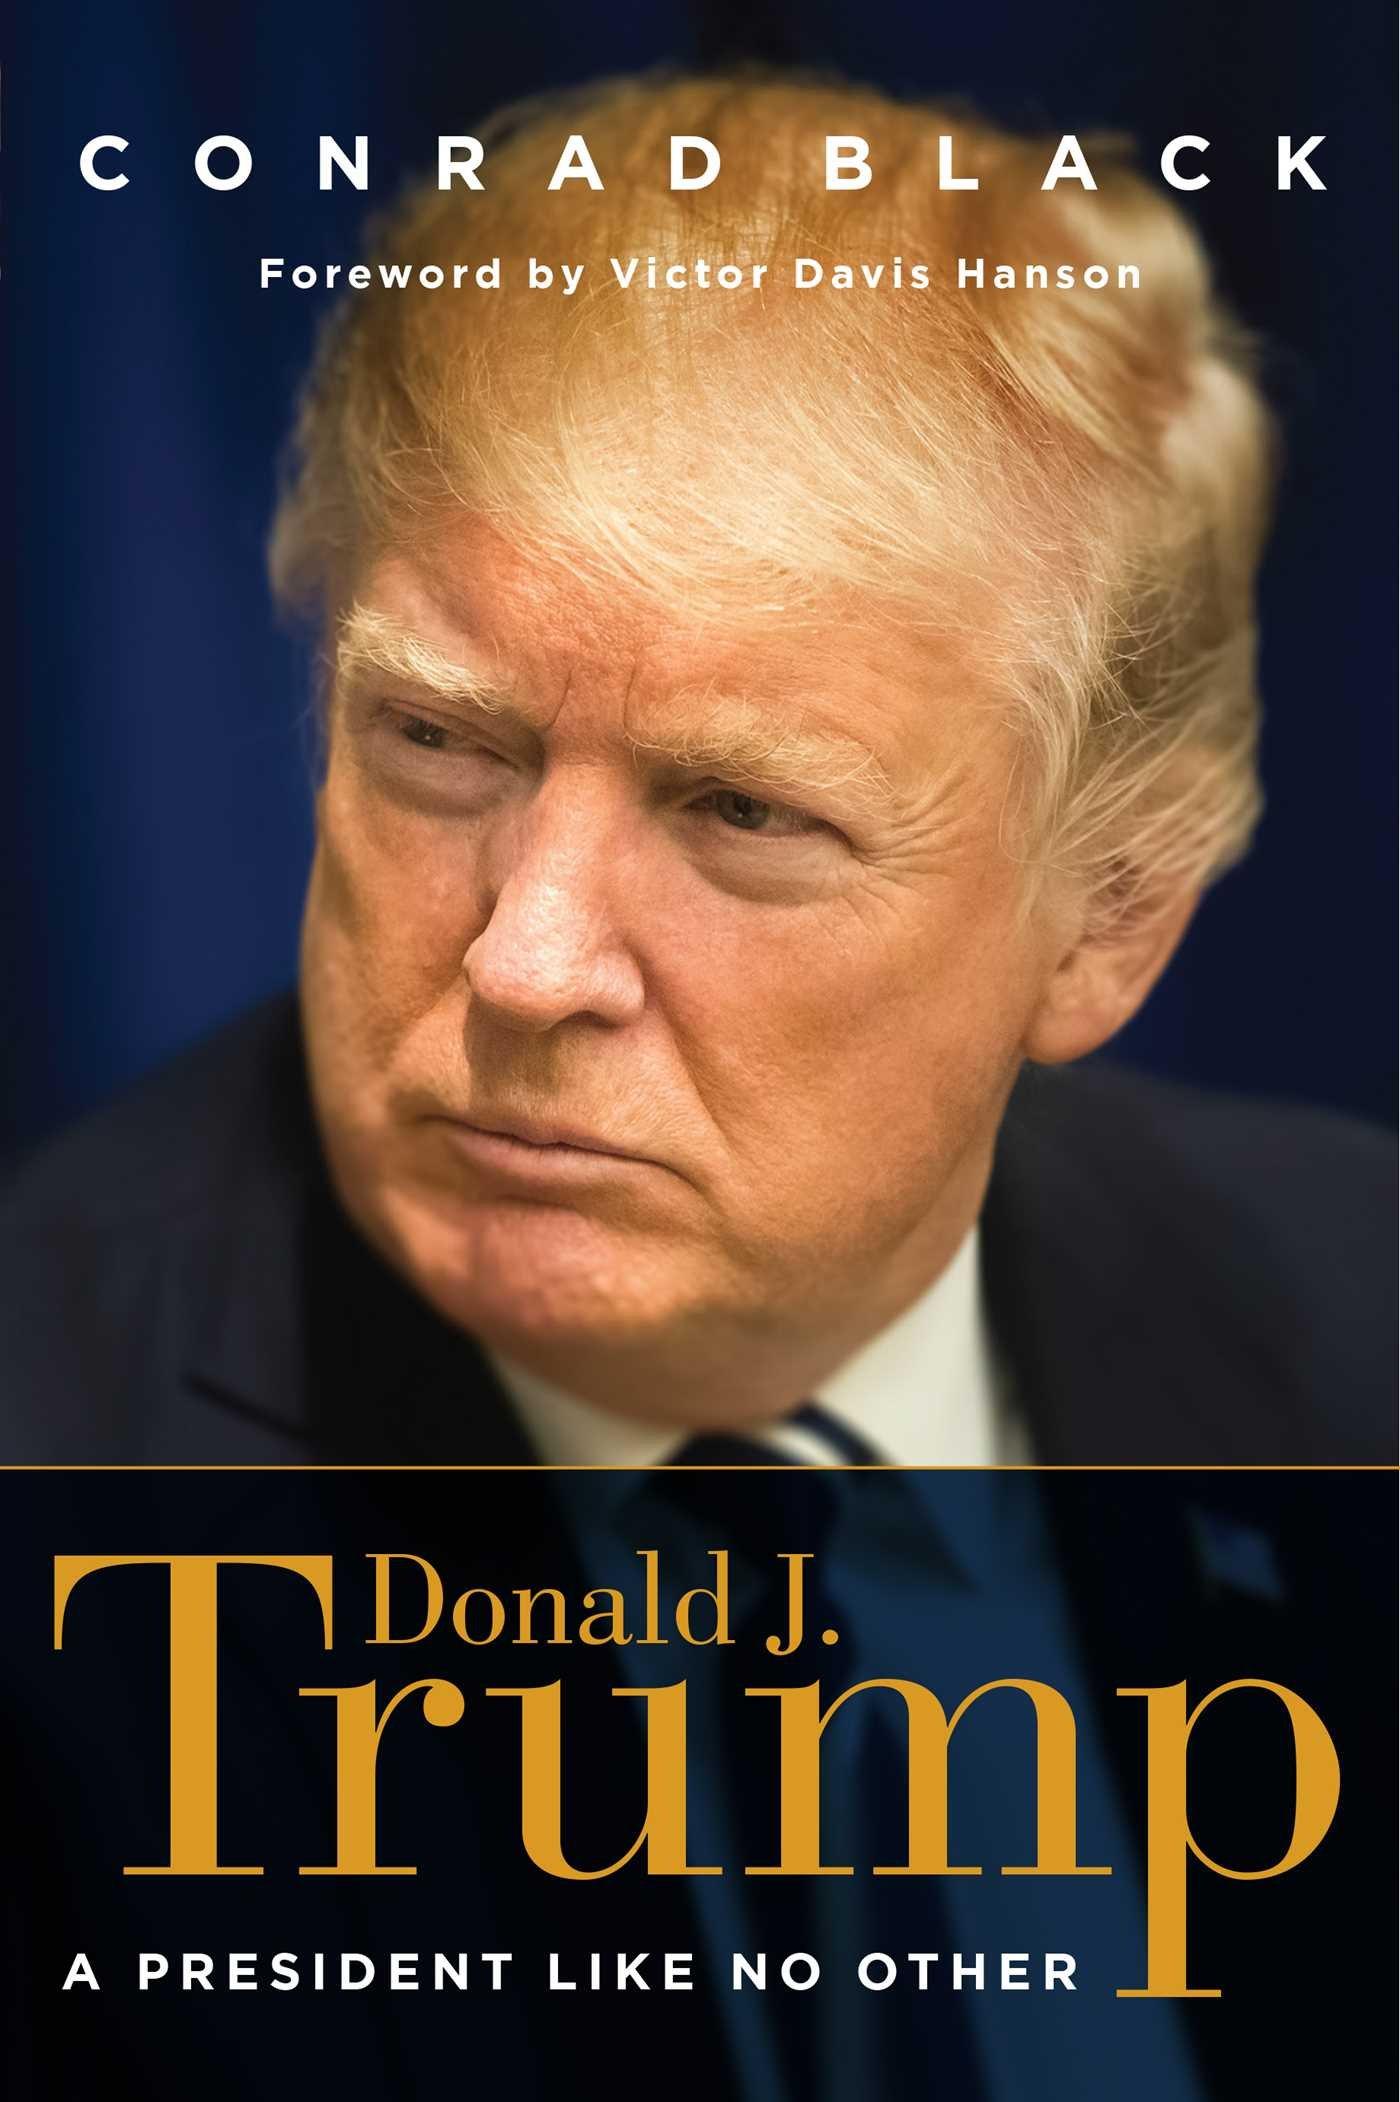 🕊 Дональд Трамп помиловал медиамагната Конрада Блэка